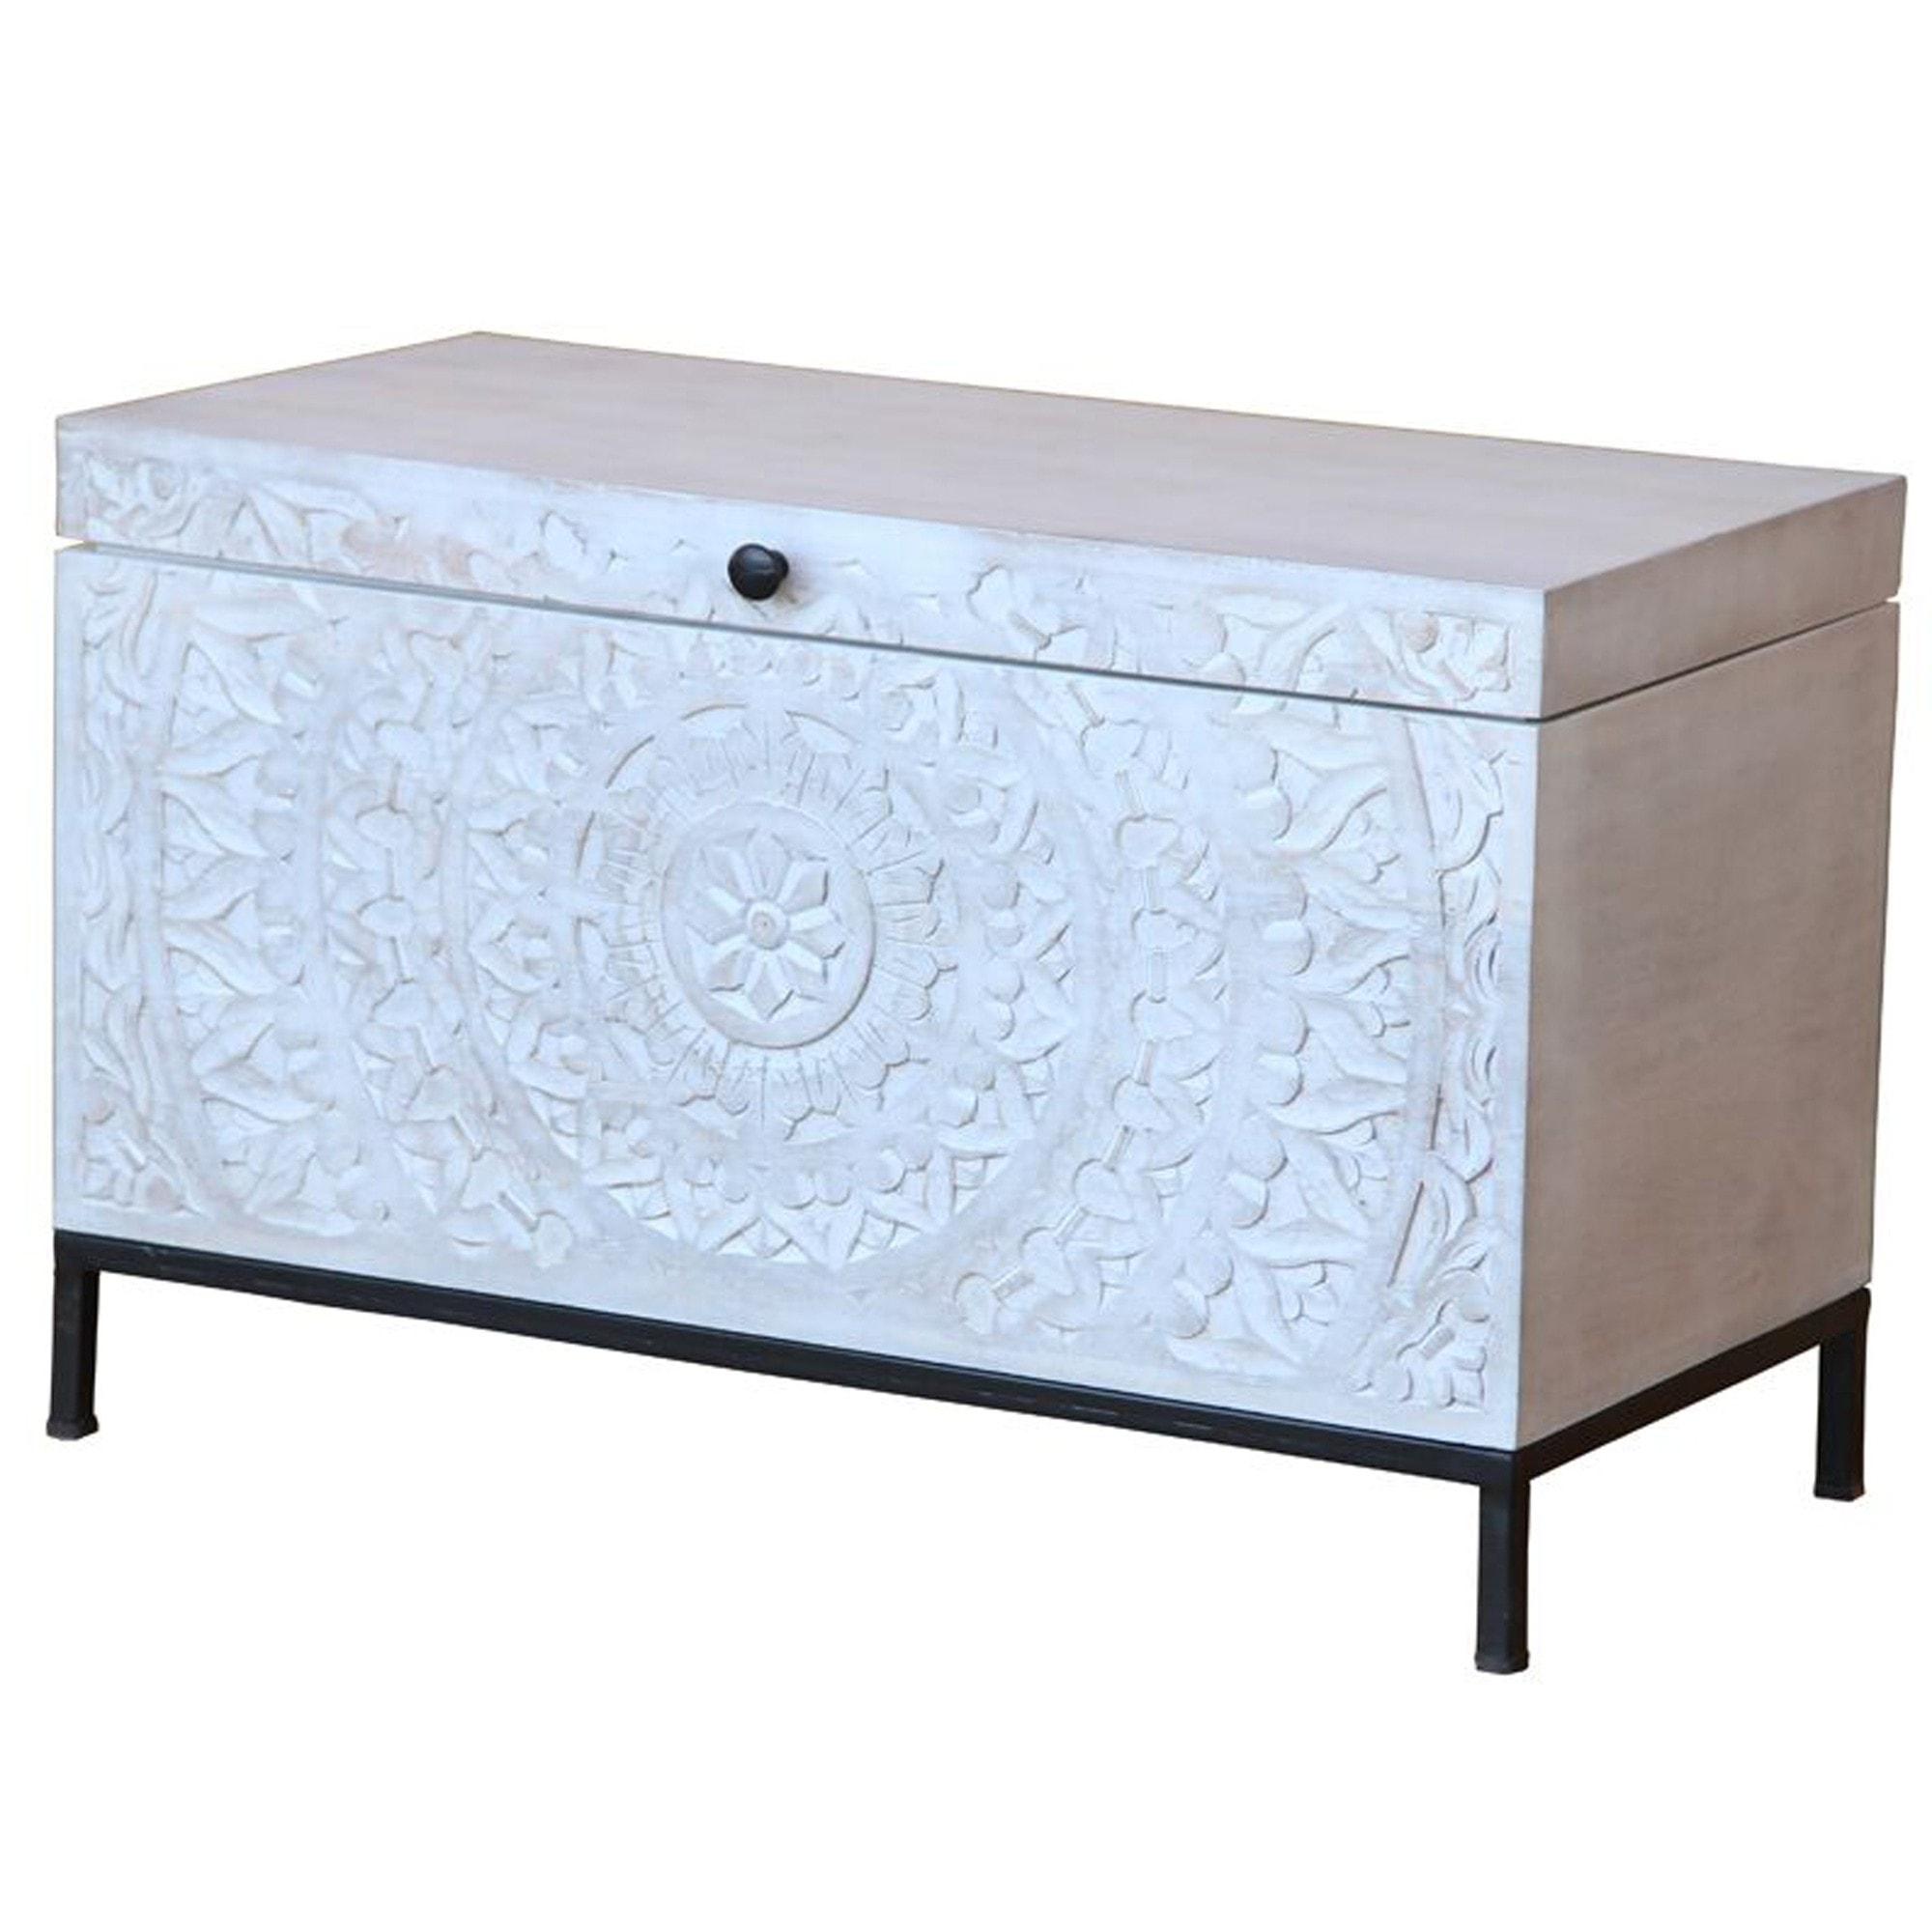 Chennai Box Wooden White Box Indian Furniture Wooden Indian